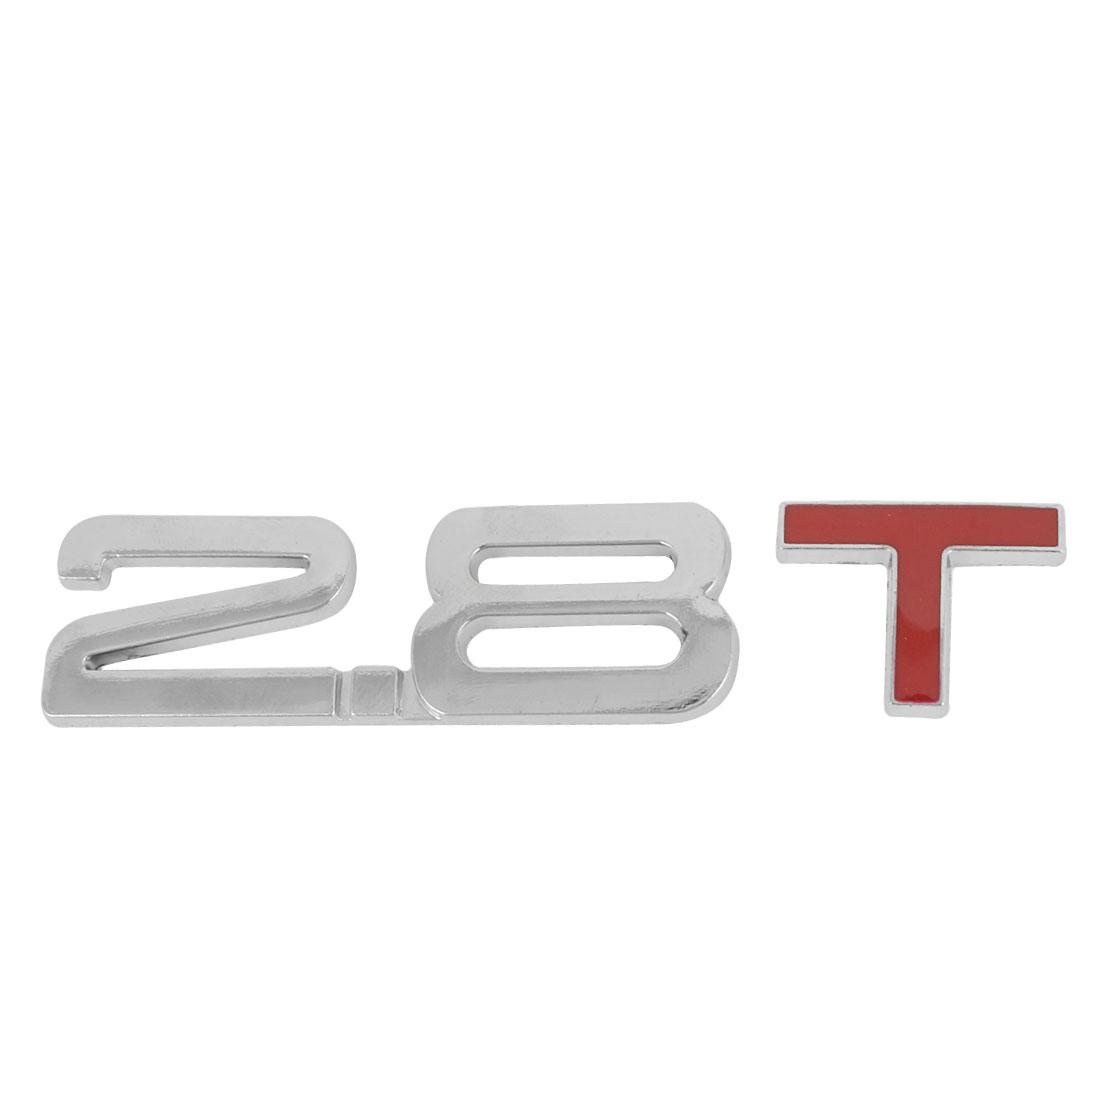 Red Silver Tone Metal 2.8 T Design Car Auto Grille Emblem Badge Ornament